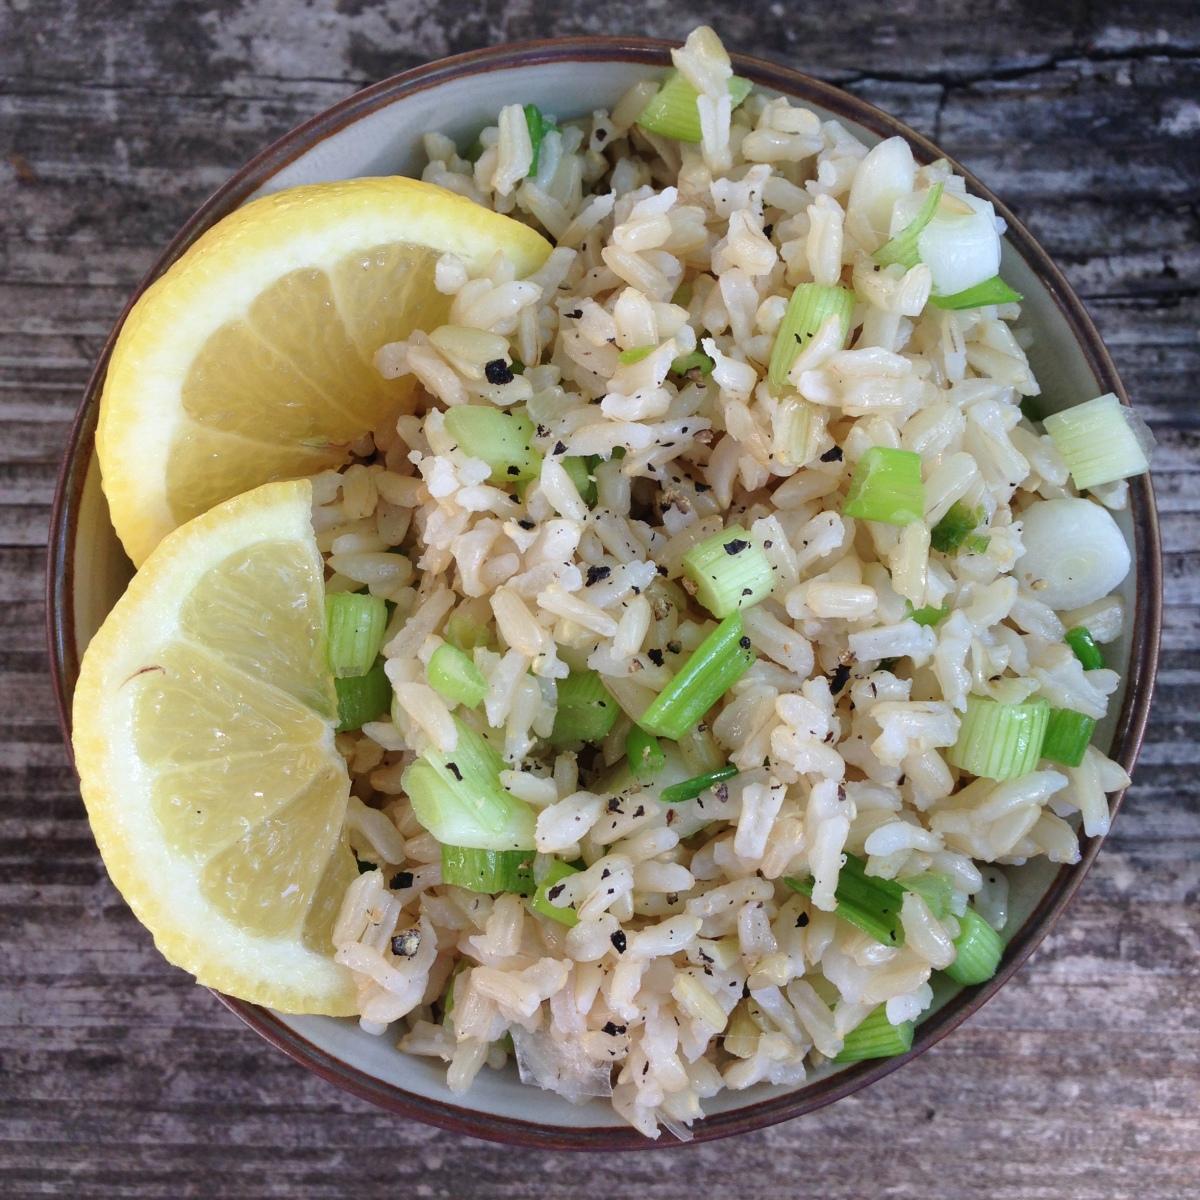 Lemon and Onion Rice